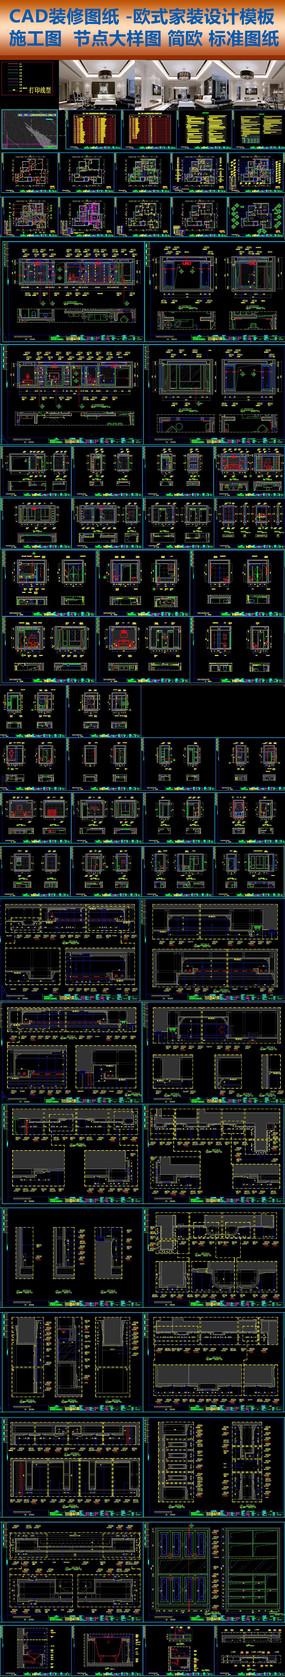 CAD欧式家装施工图效果图